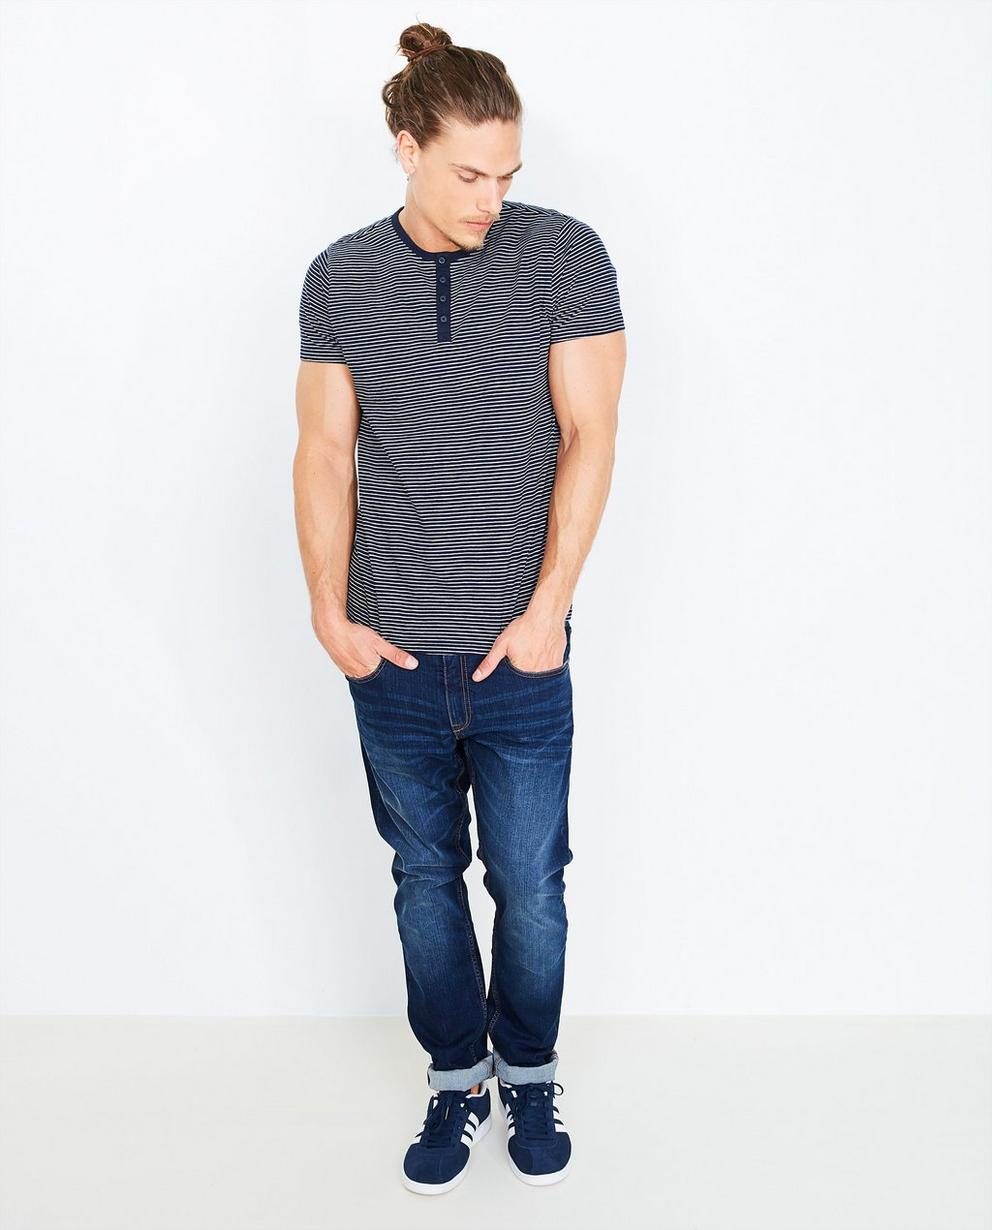 Gestreept T-shirt - in donkerblauw-wit - Quarterback